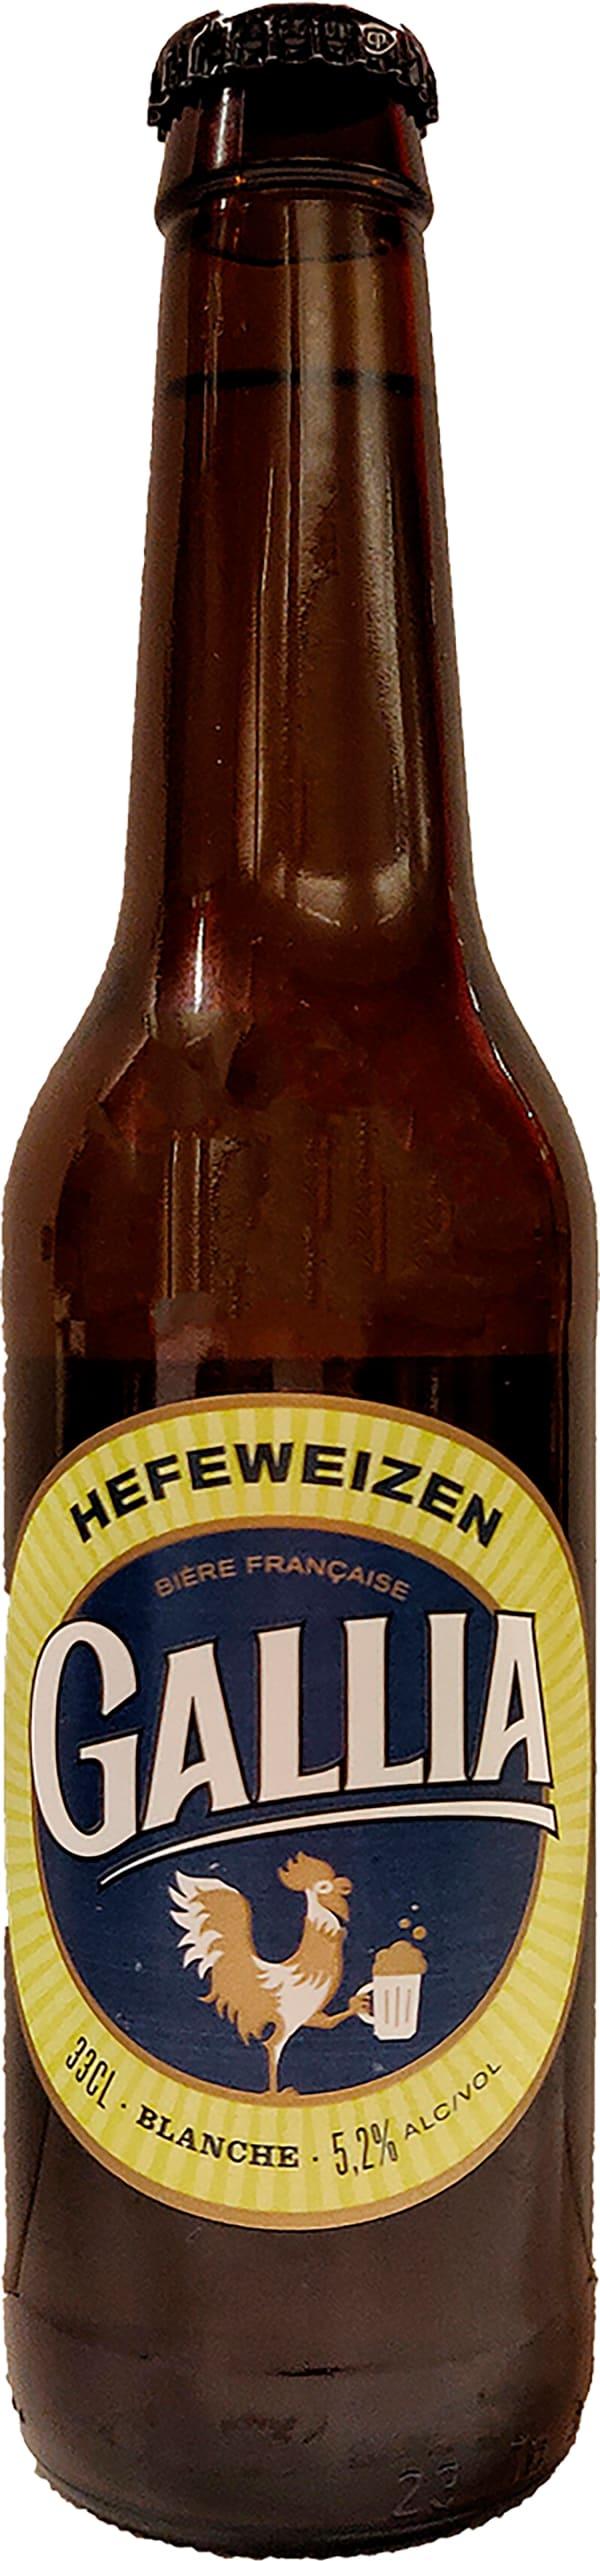 Gallia Hefeweizen